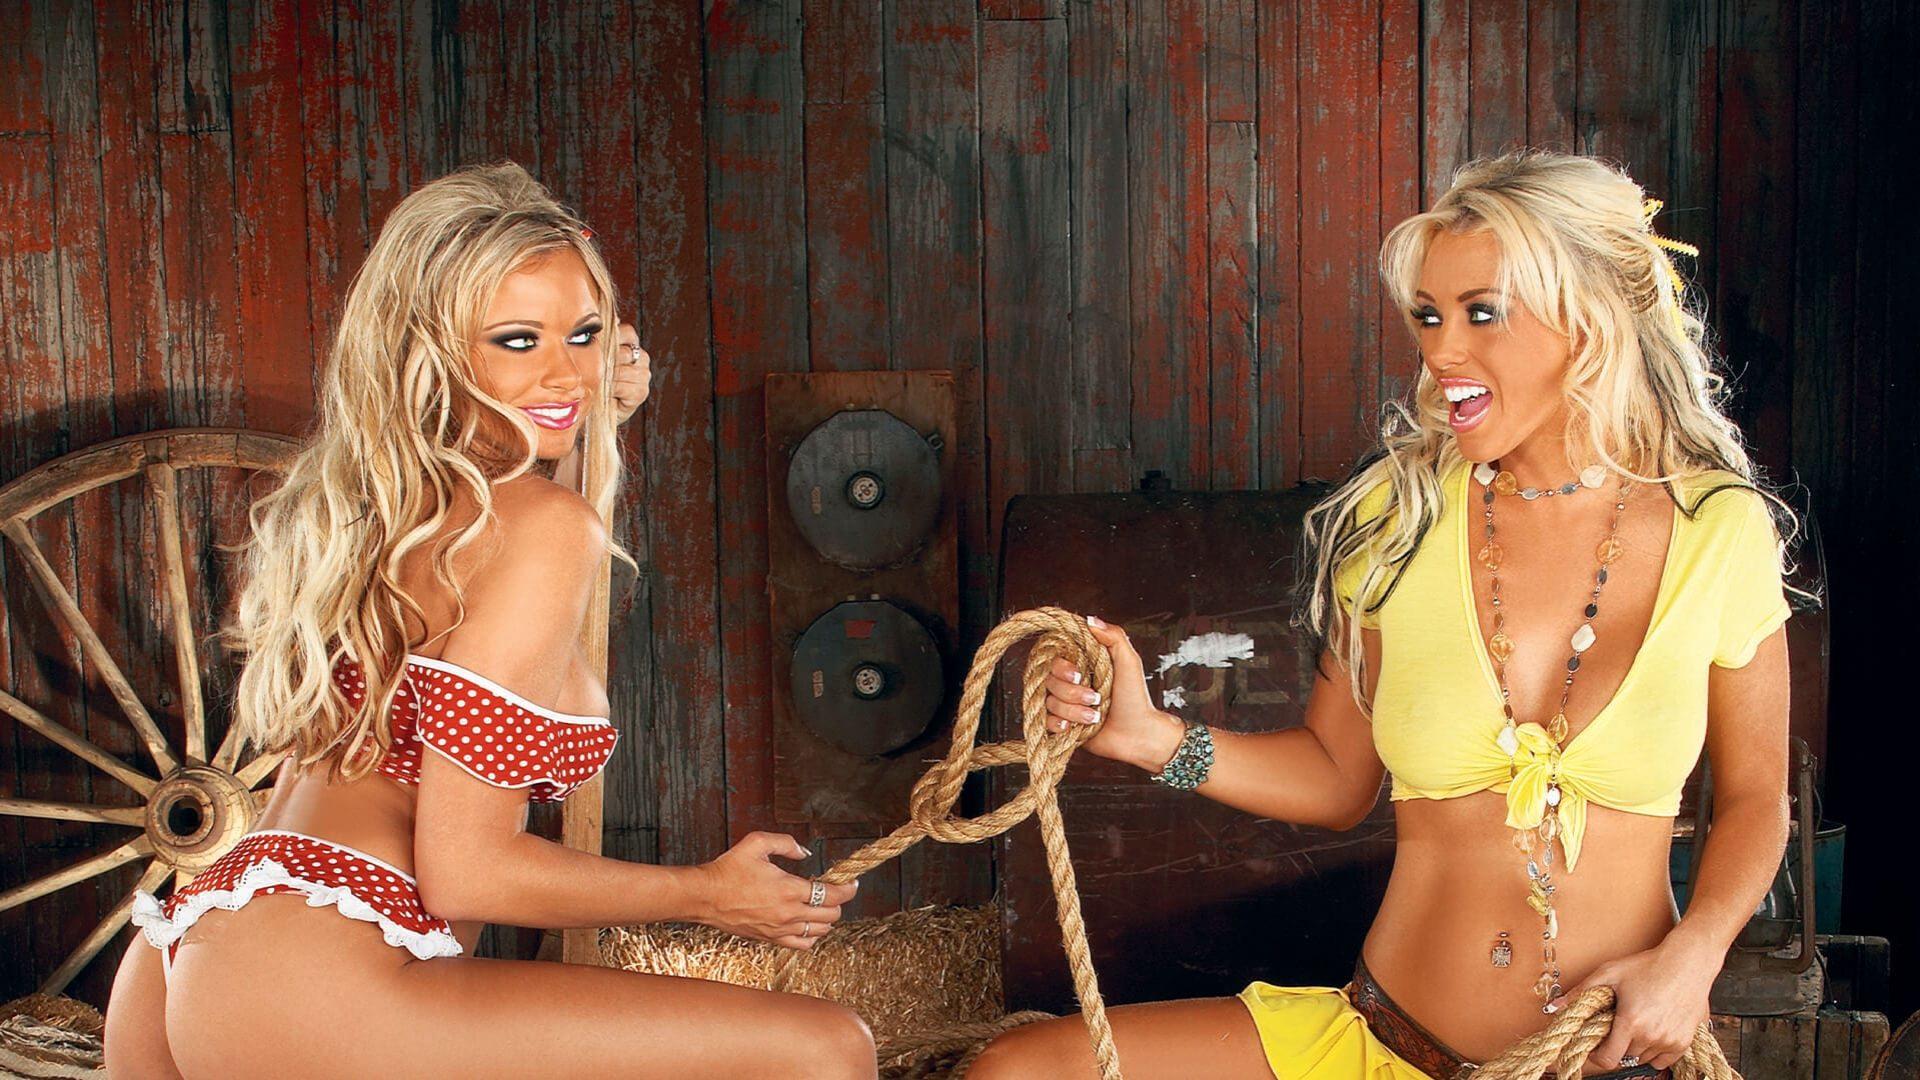 HUSTLER Honey Briana Banks & Brittney Skye